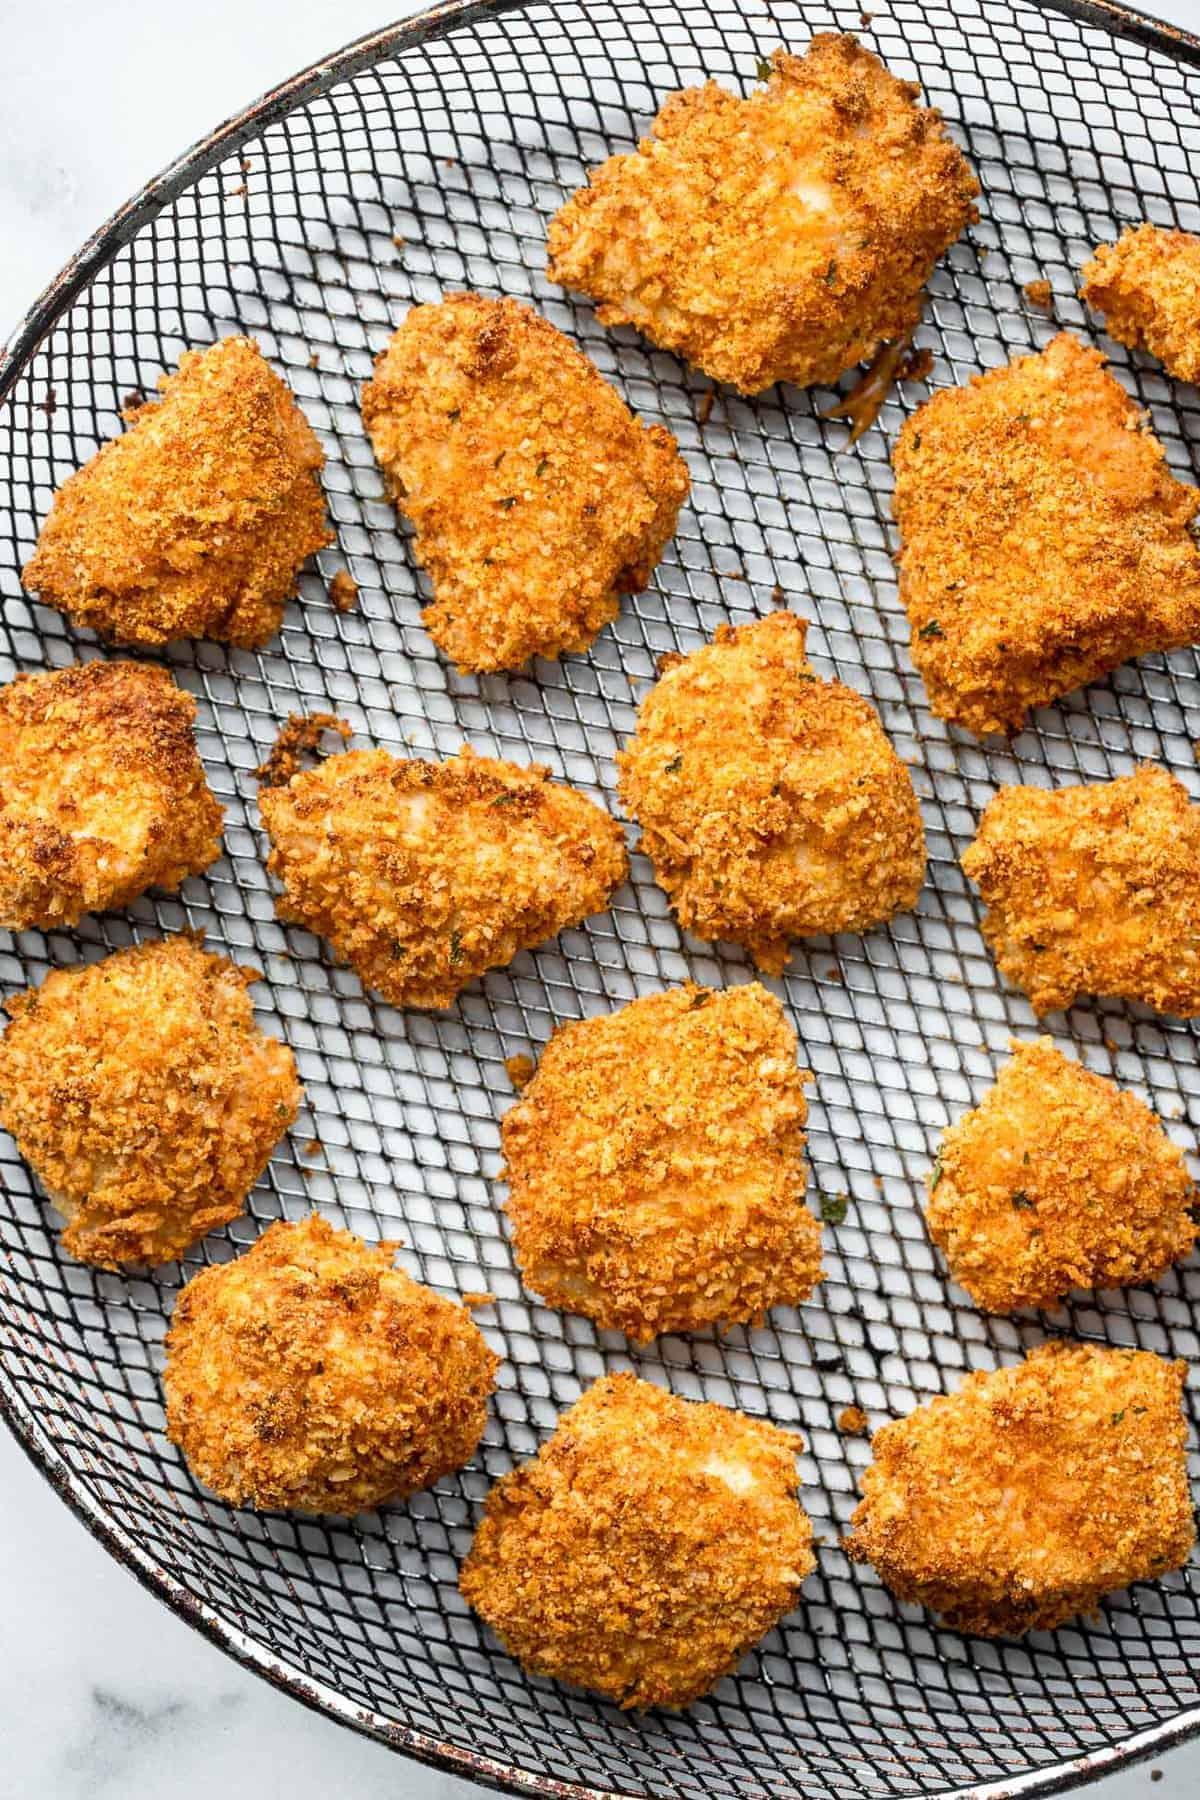 chicken nuggets in air fryer on a mesh basket